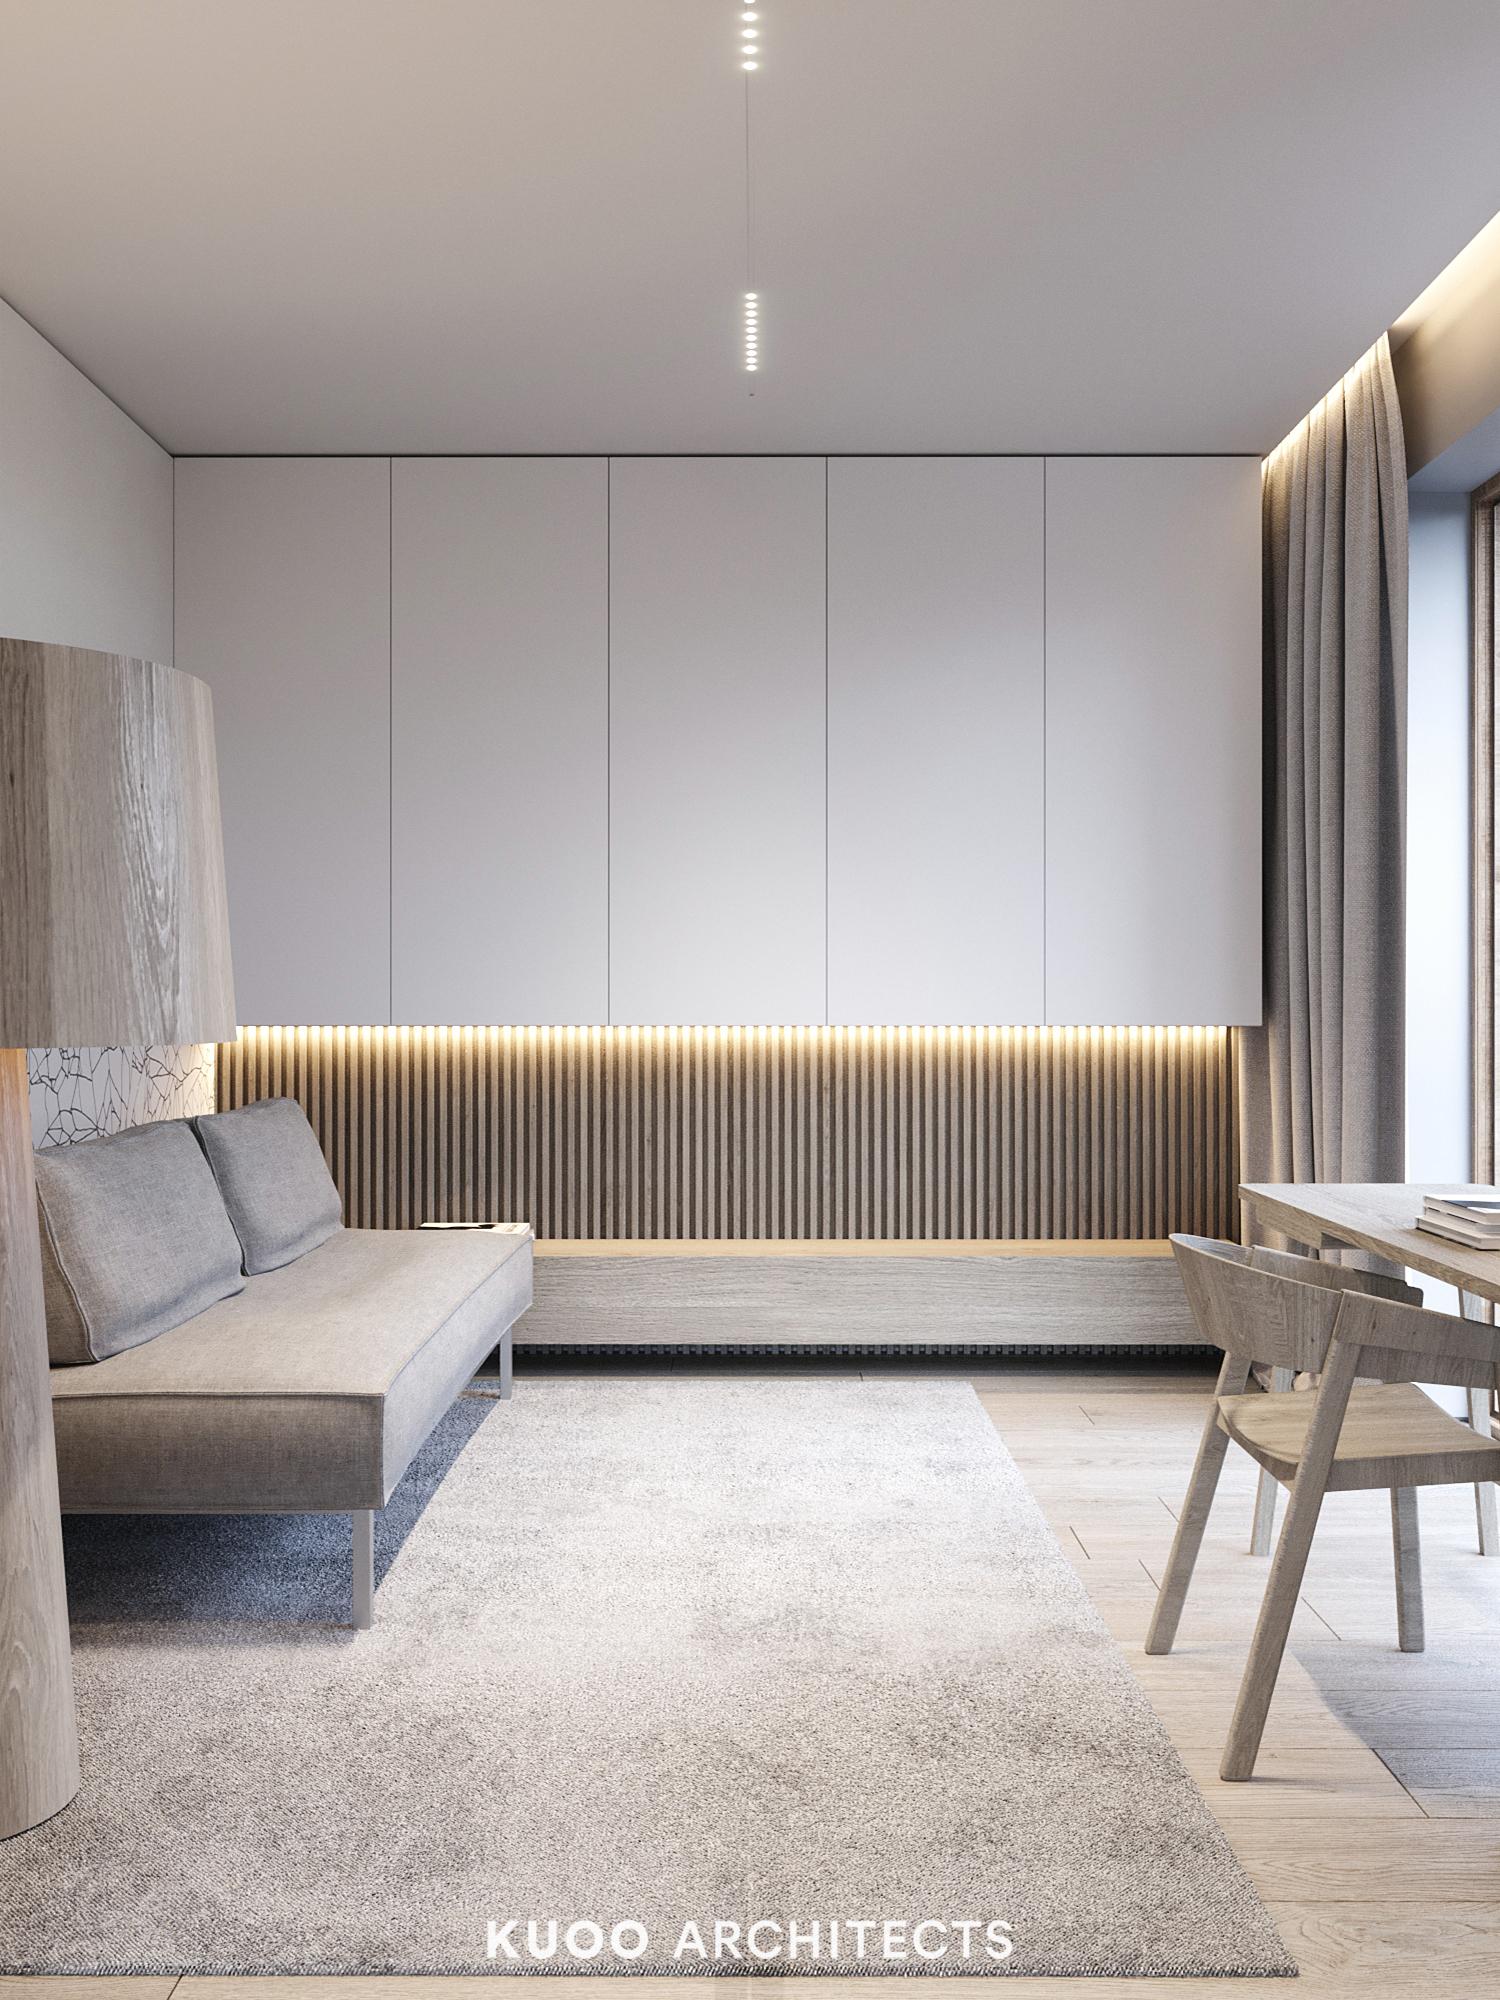 kuoo_architects_ap_warsaw_8_01